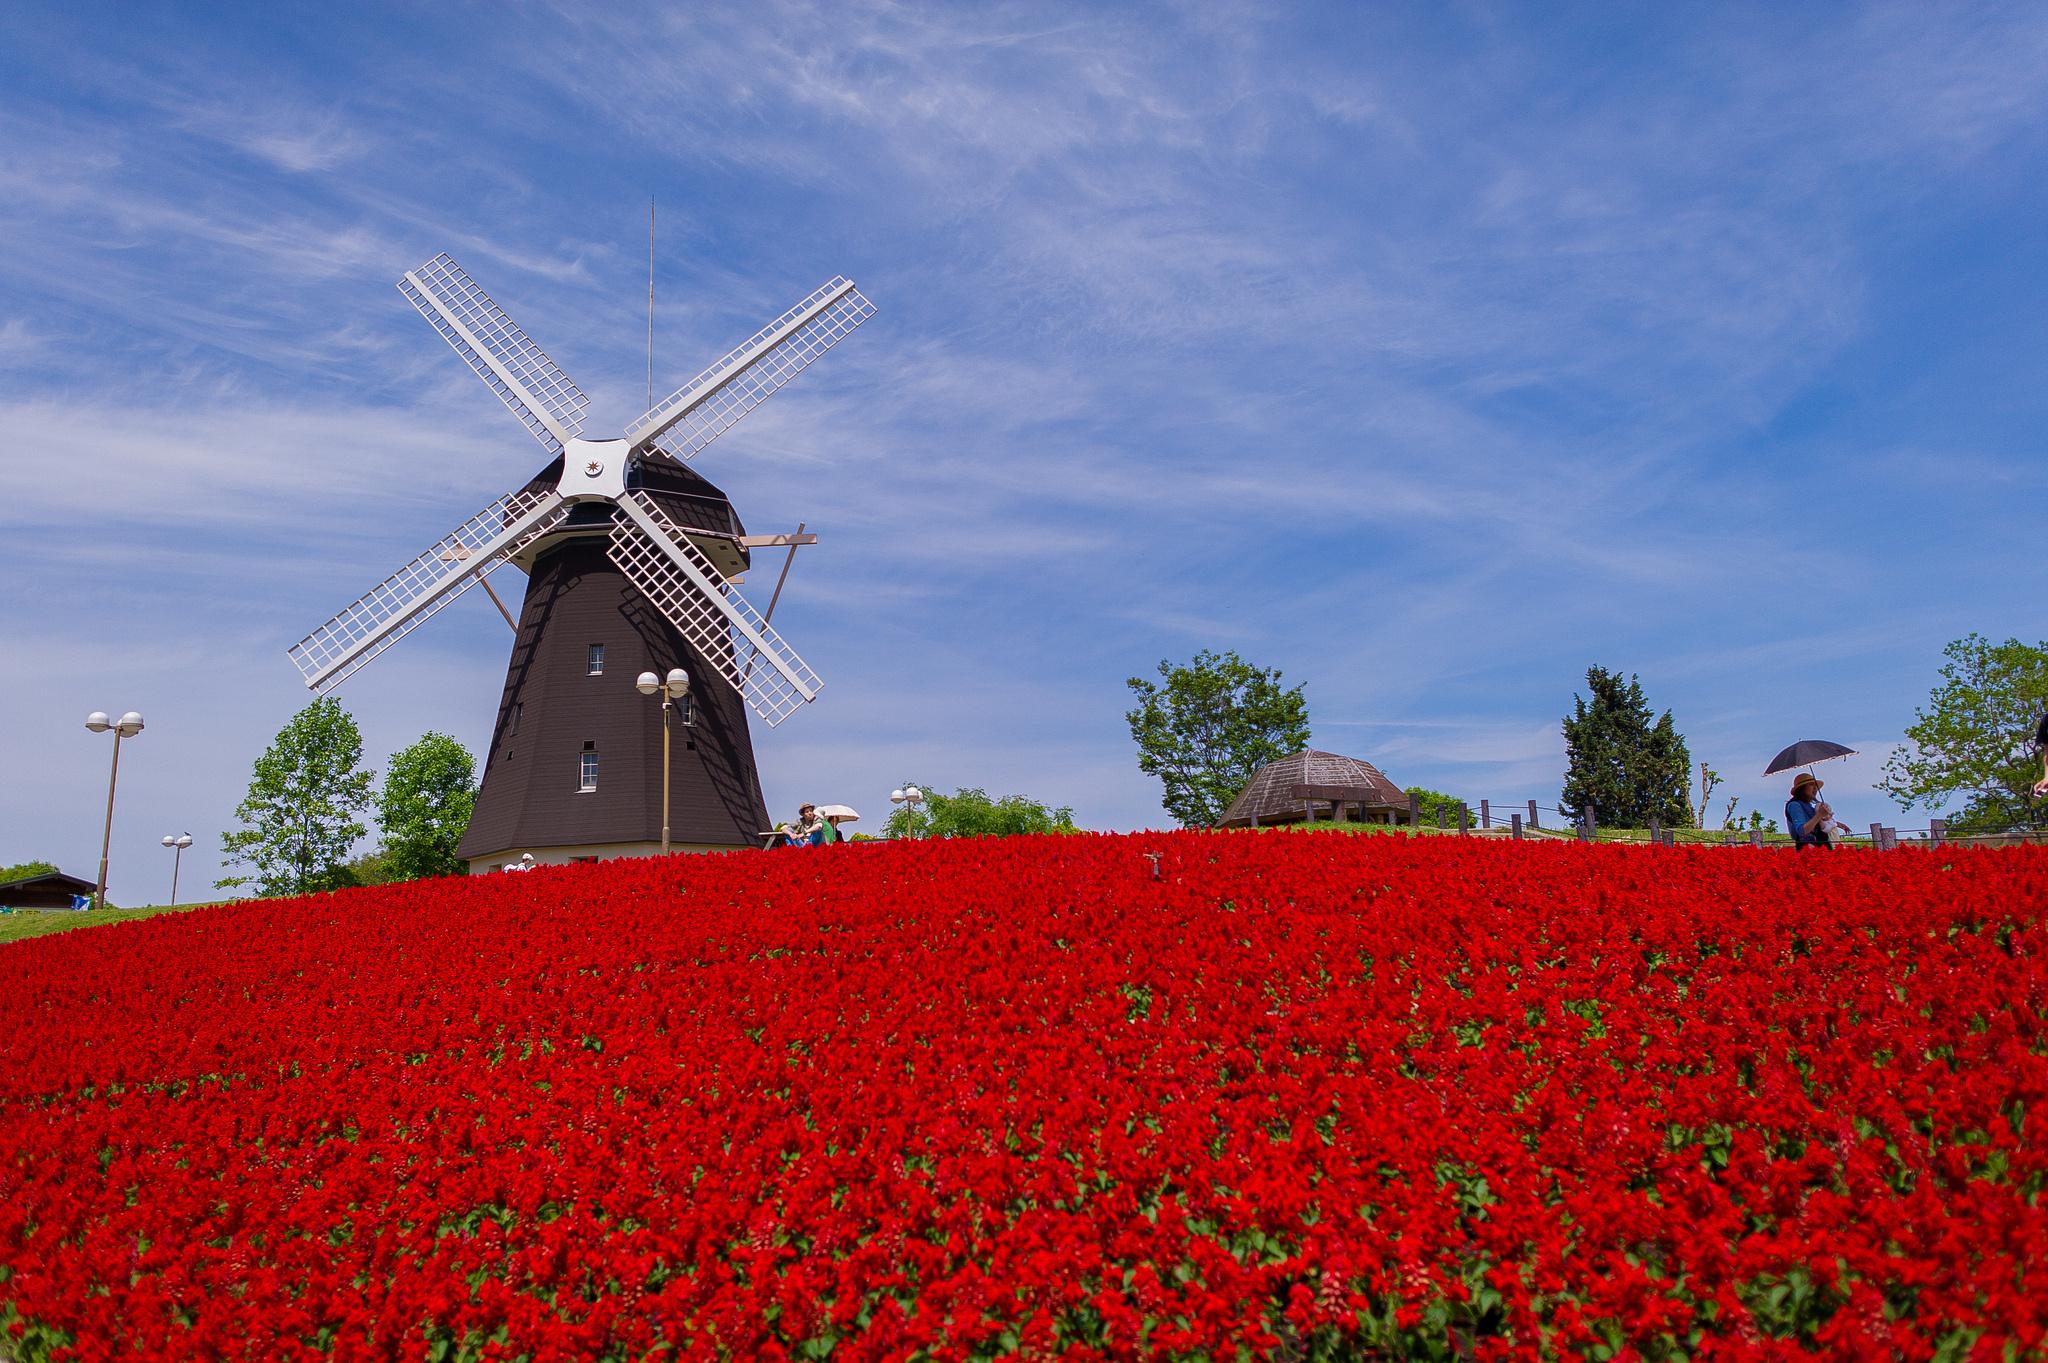 Flower Red Field Windmill Mill Wallpaper 2048x1363 135923 Wallpaperup